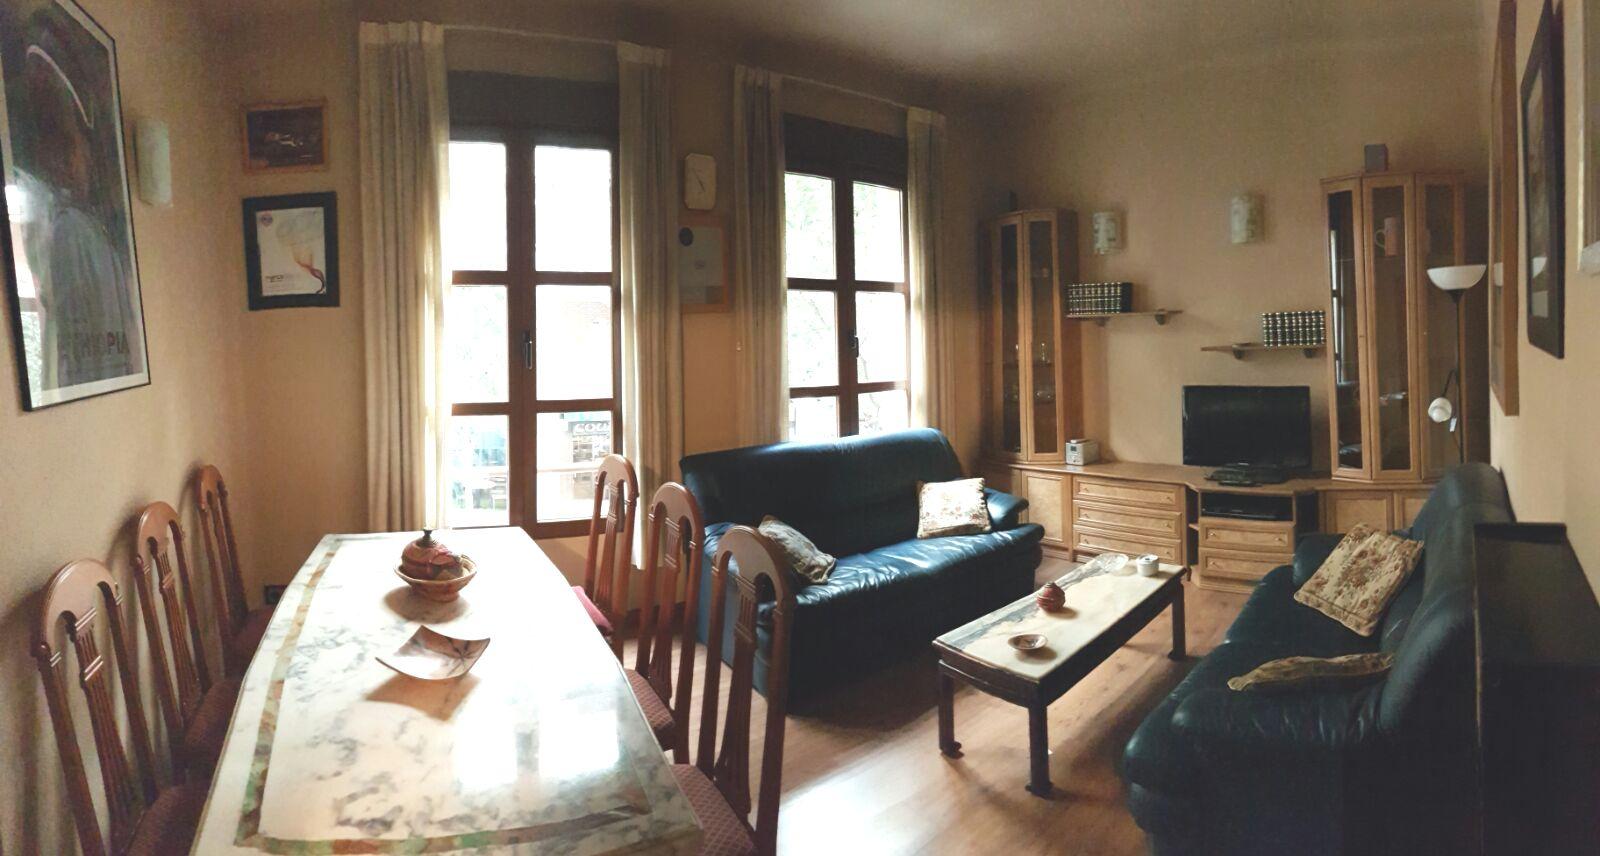 Piso en alquiler en calle menorca ibiza retiro madrid for Alquiler piso retiro